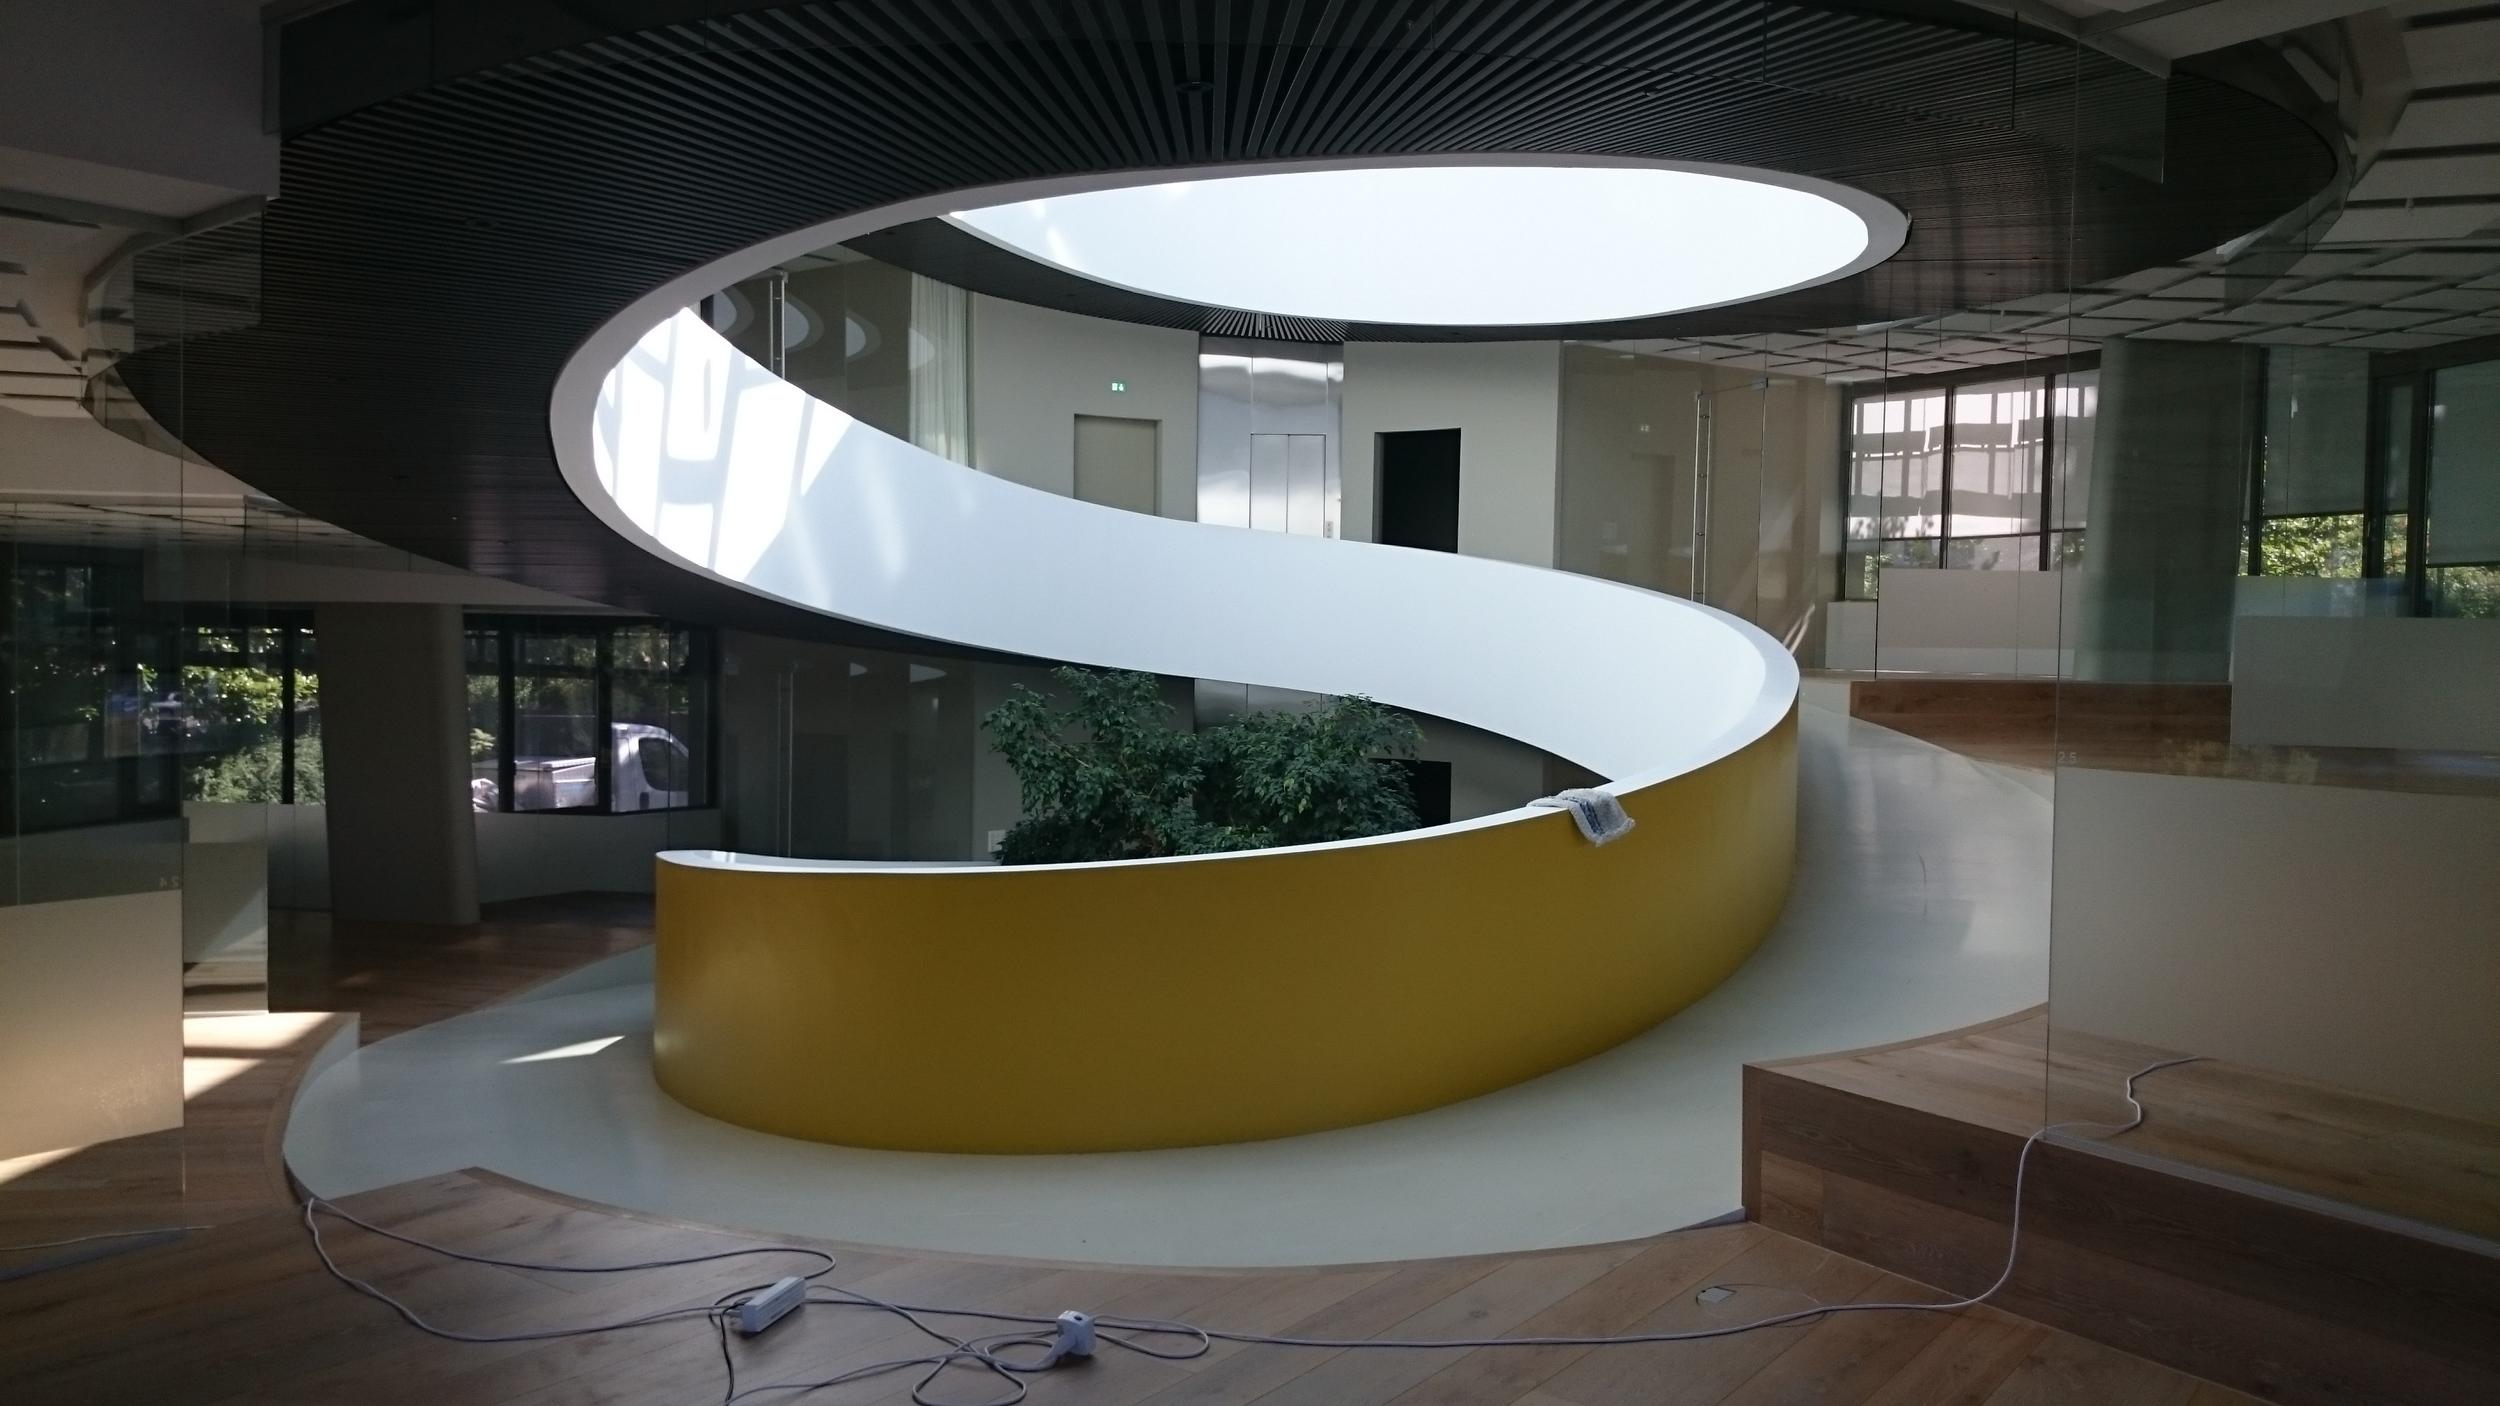 Inside the cocoon shown earlier